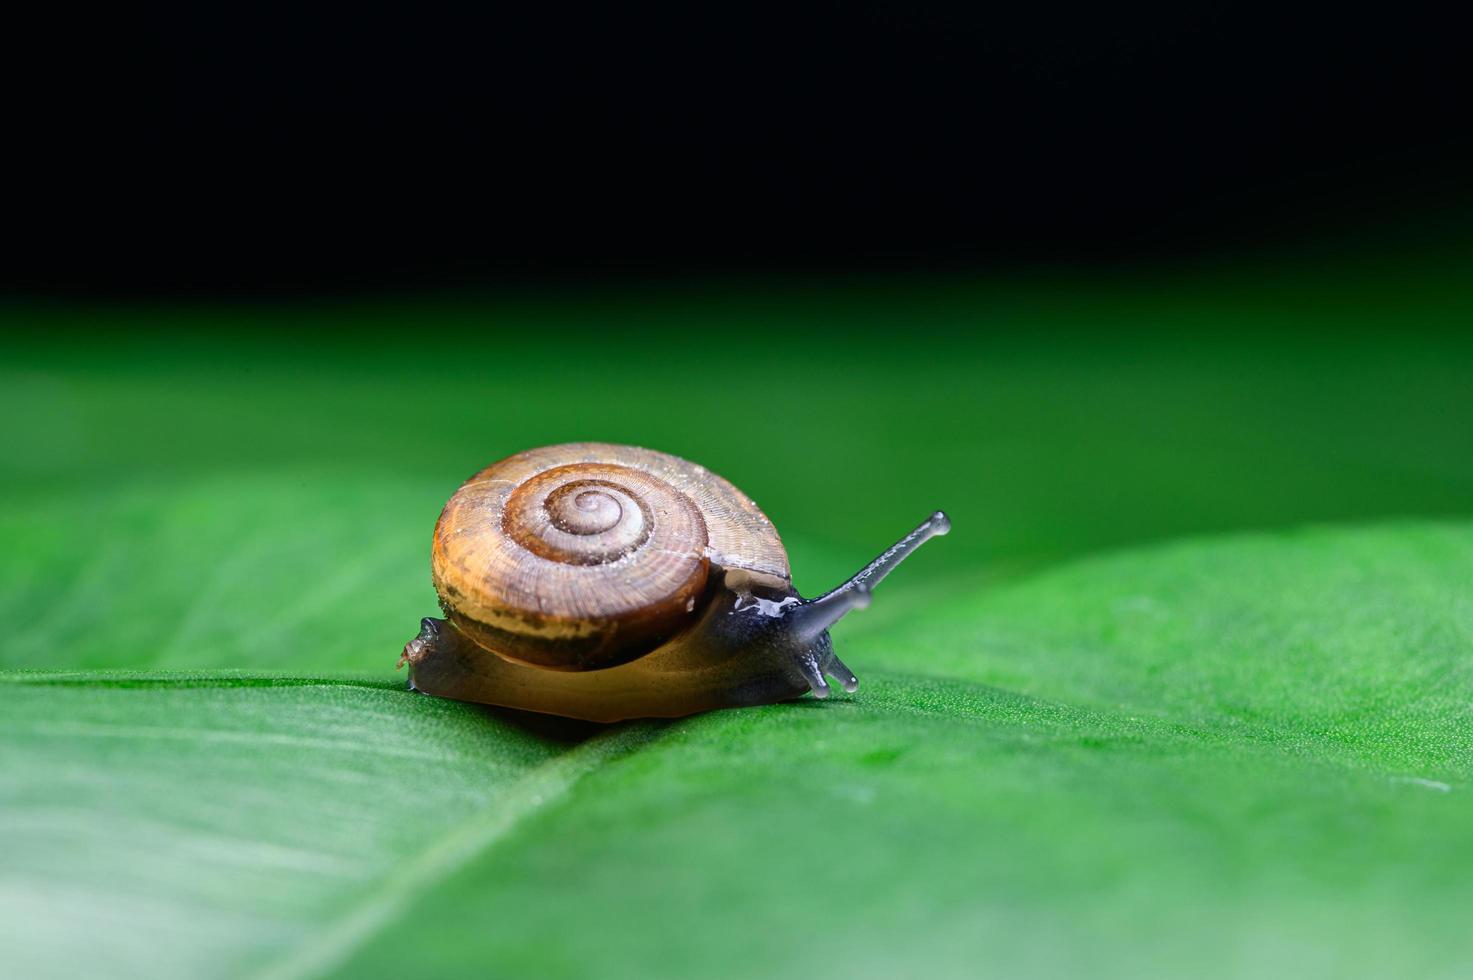 Snail on a leaf photo